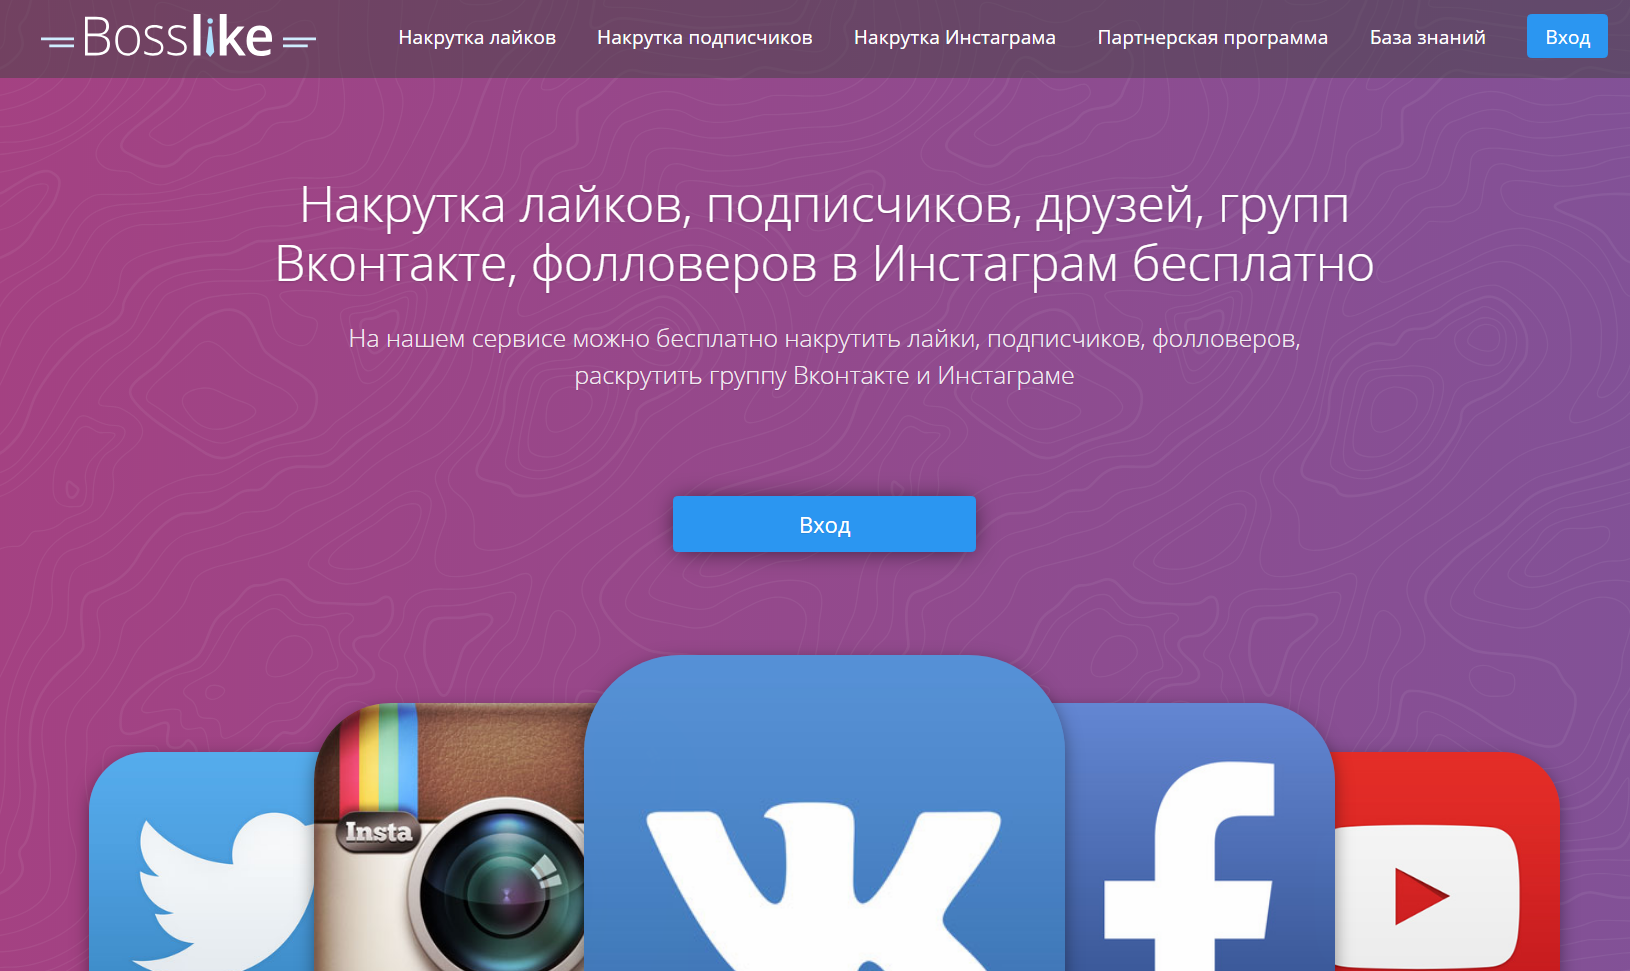 bosslike.ru